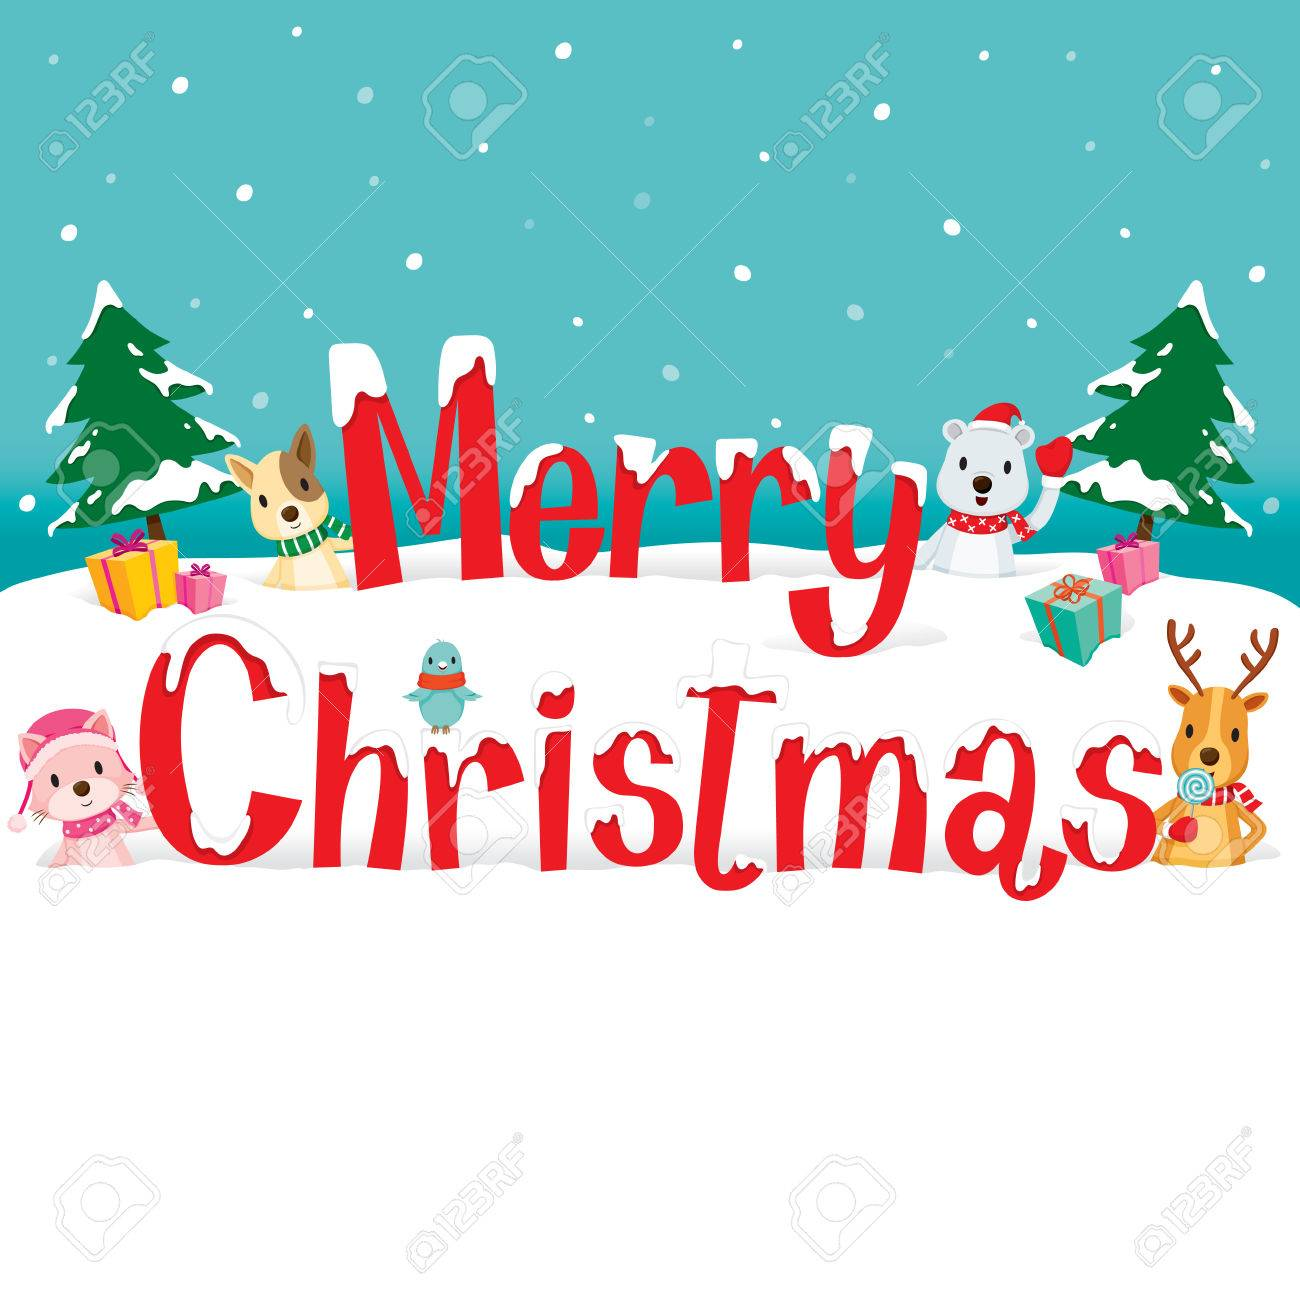 Joyeux Noel Audio.Animaux Et Joyeux Noel Texte Joyeux Noel Noel Bonne Annee Objets Animaux Fetes Celebrations